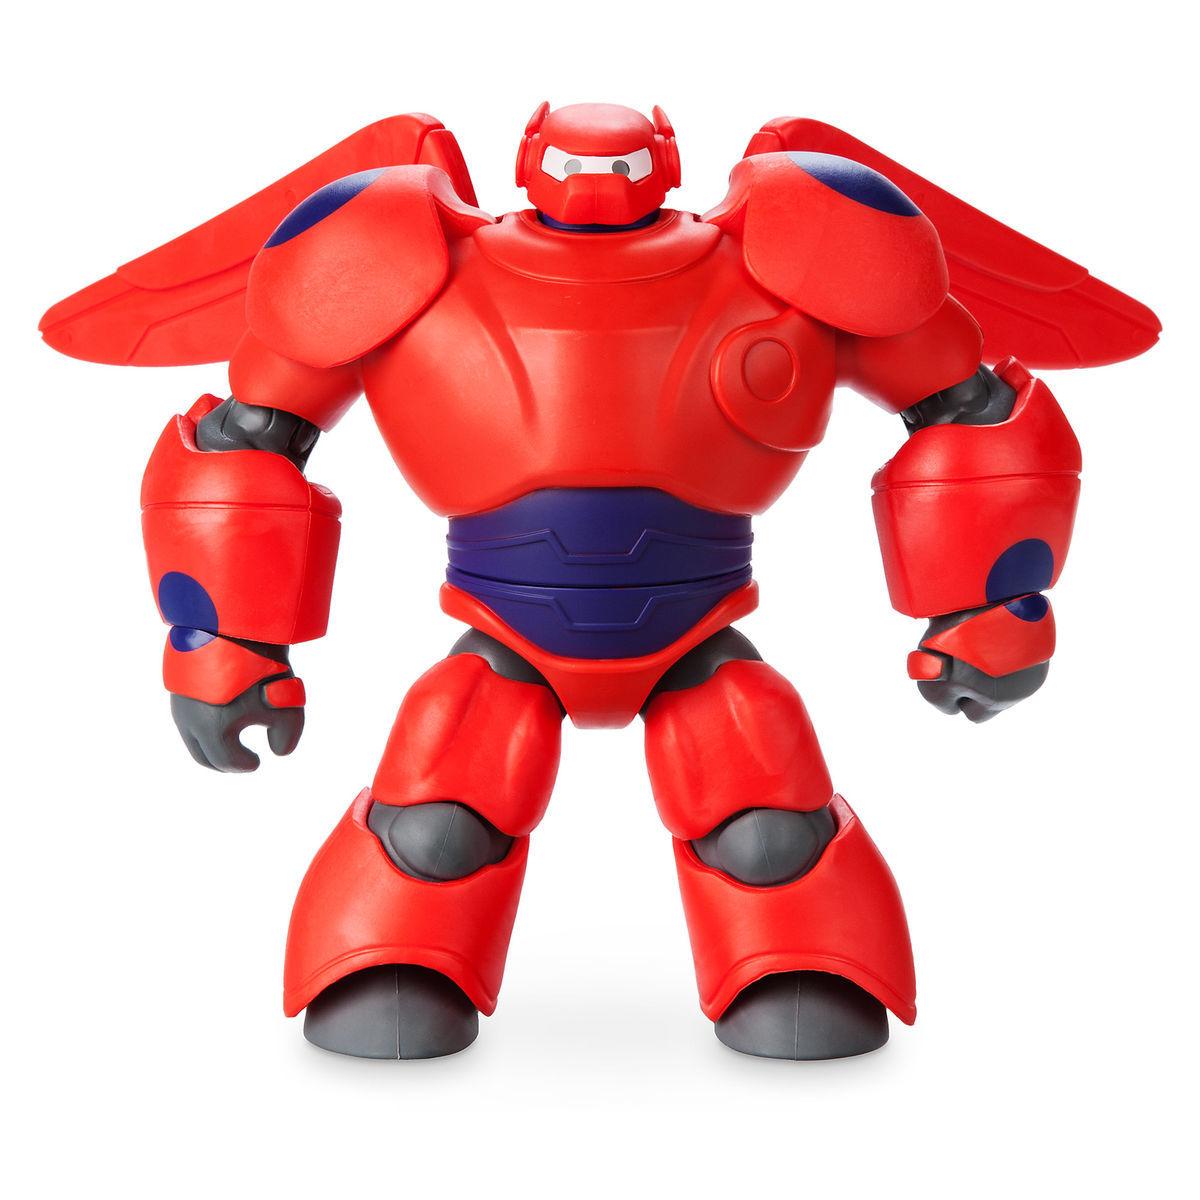 Two New Big Hero 6 Toybox Action Figures Released